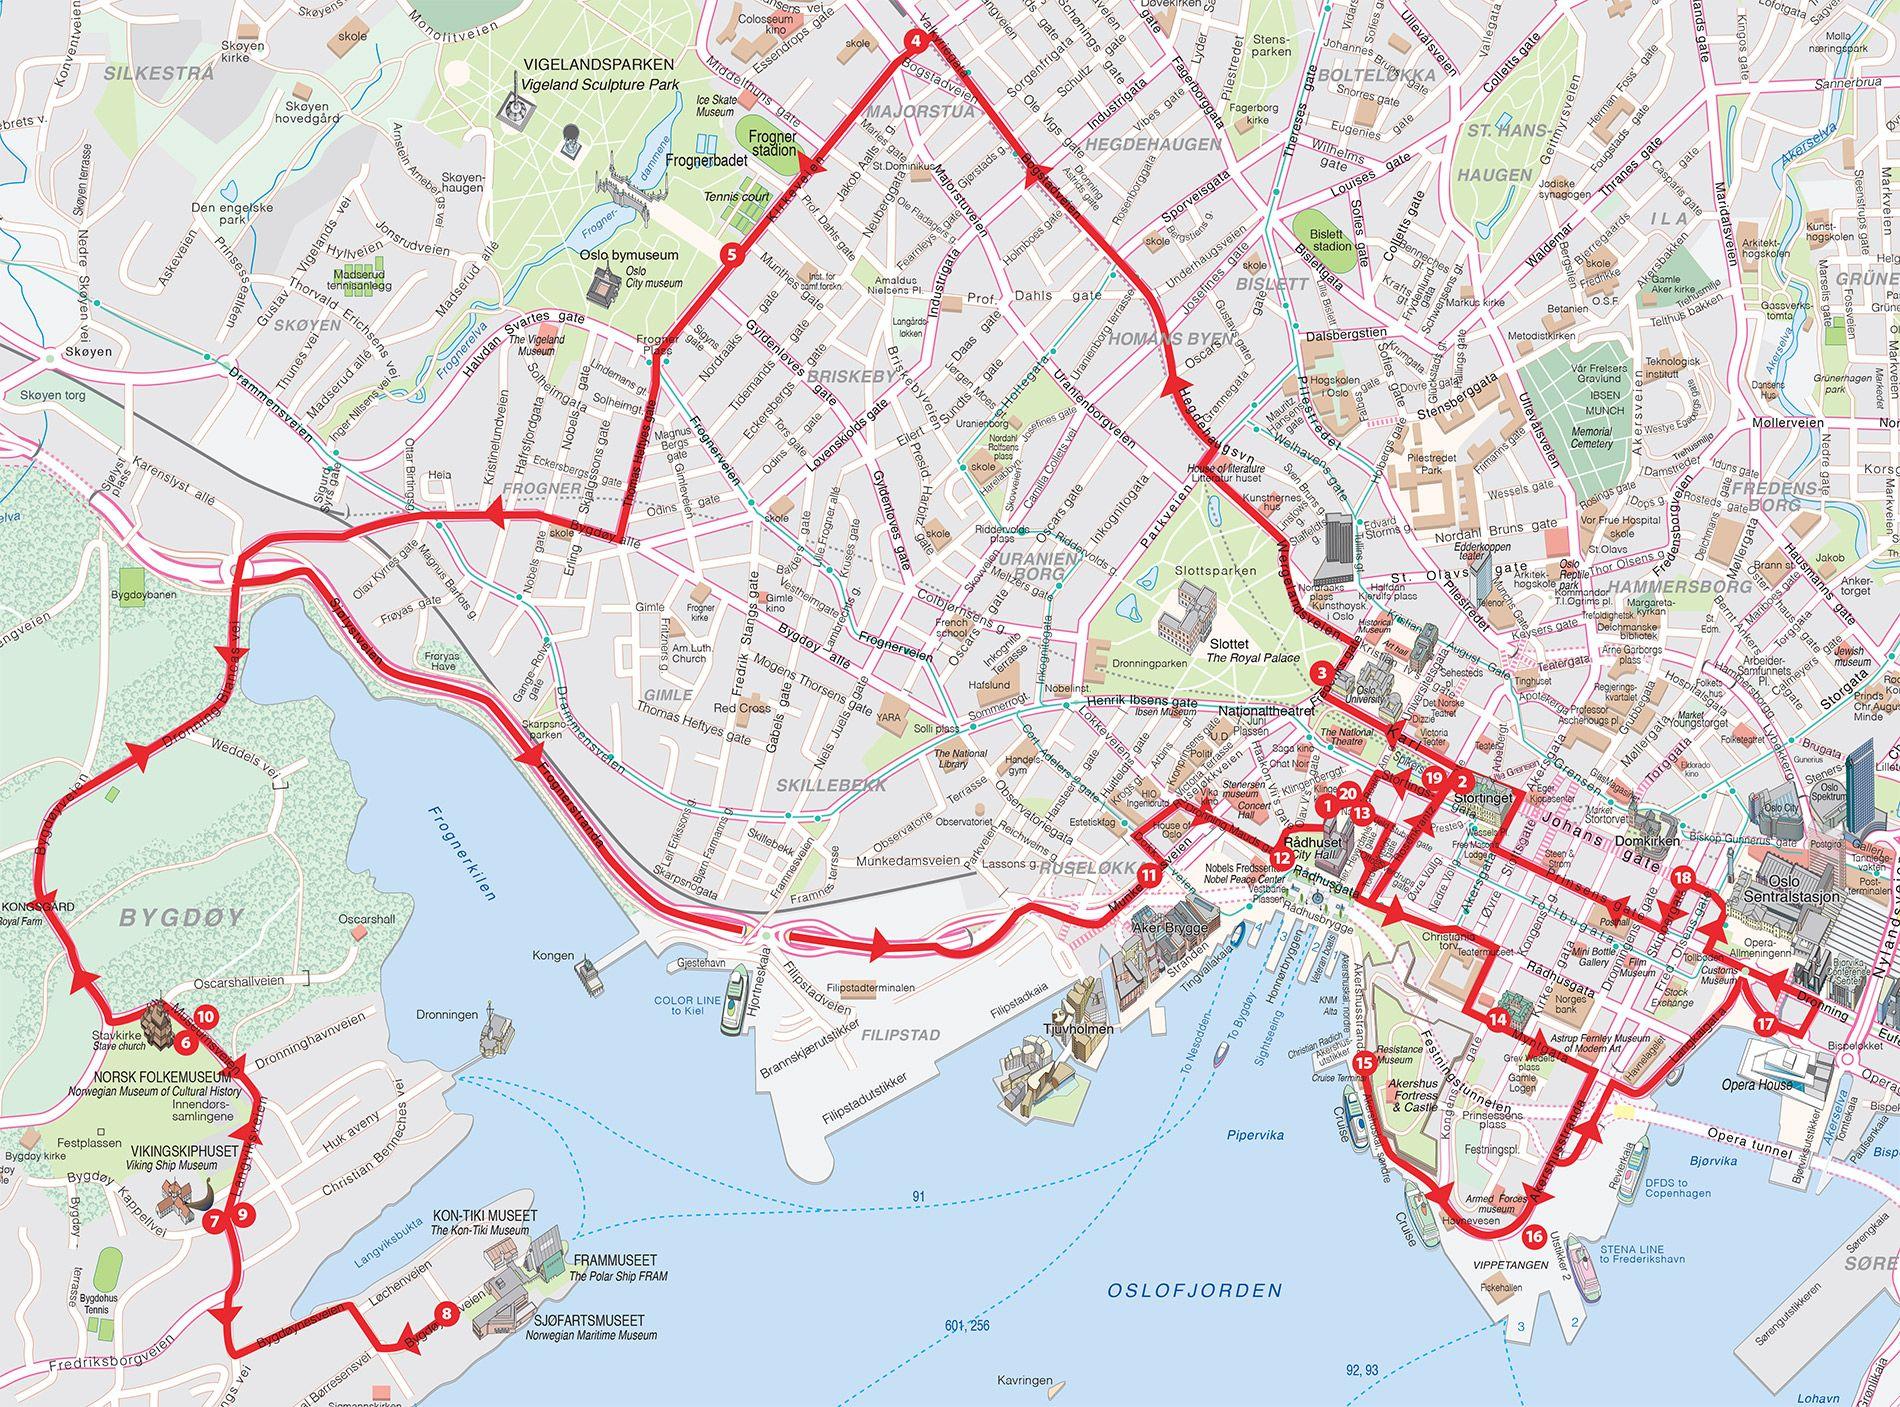 oslo kart Oslo Kart Kart over Oslo by | Kart | Pinterest | Oslo oslo kart